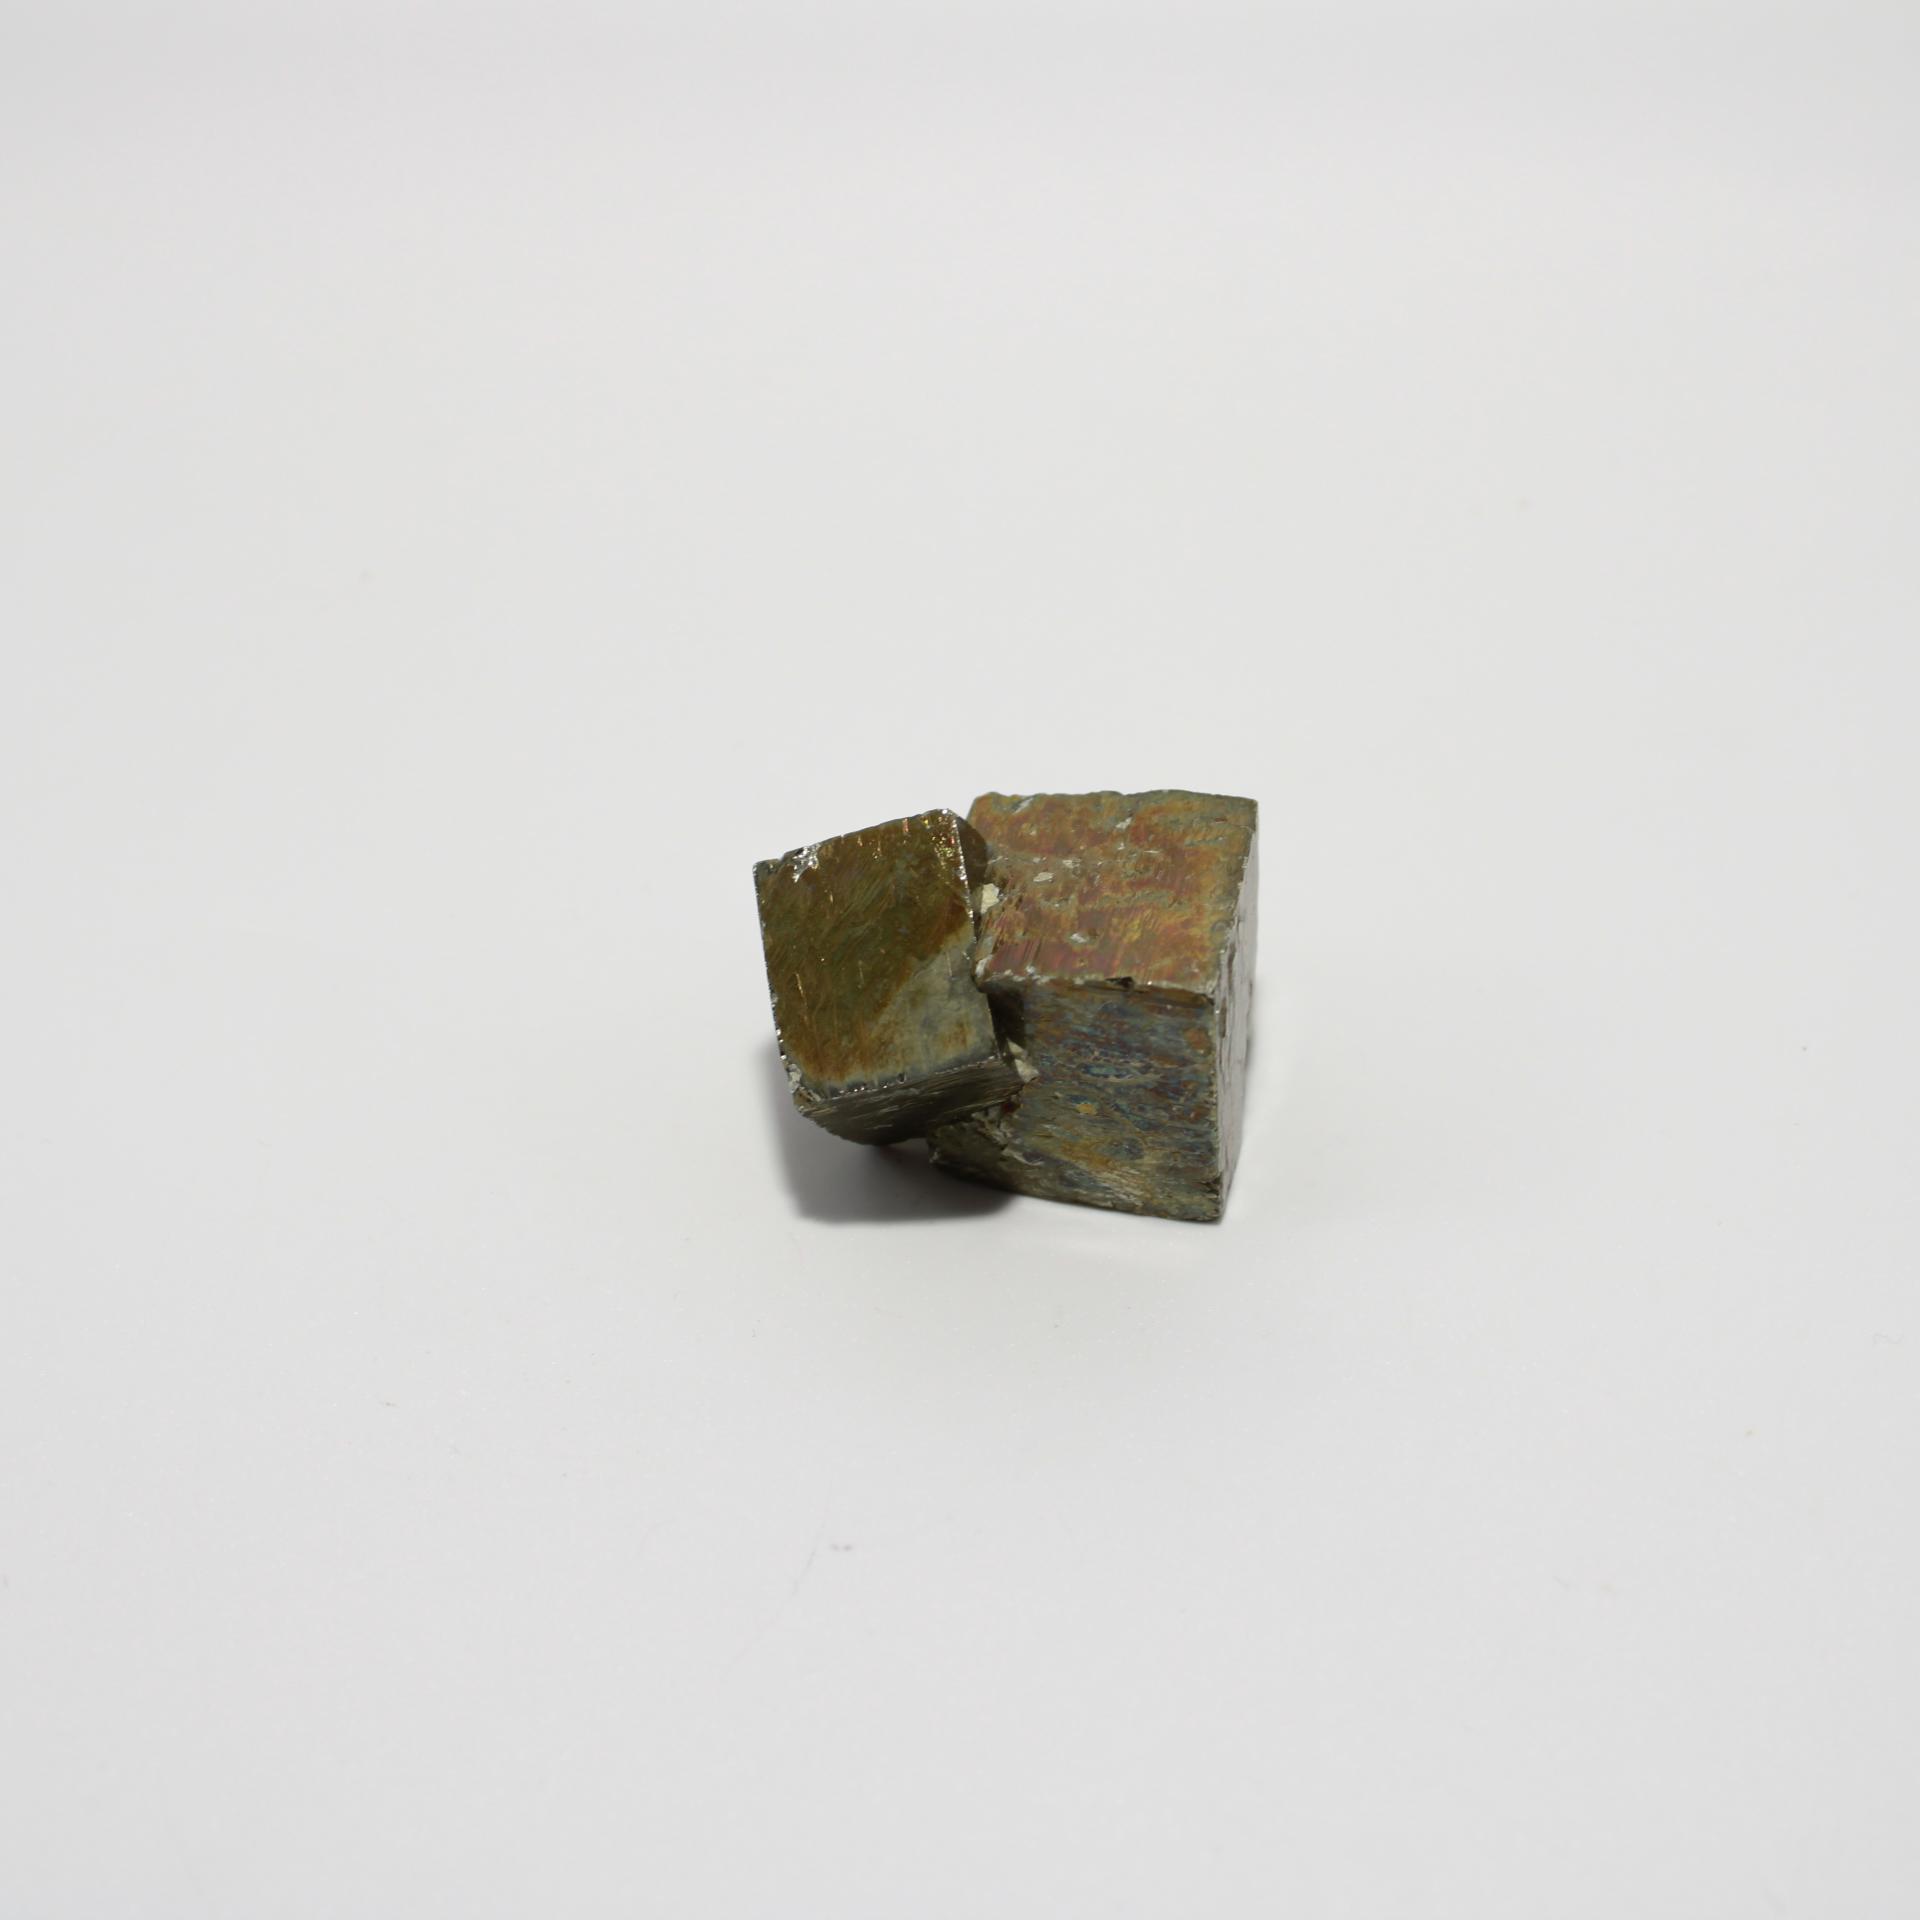 I68 pyritecube 8